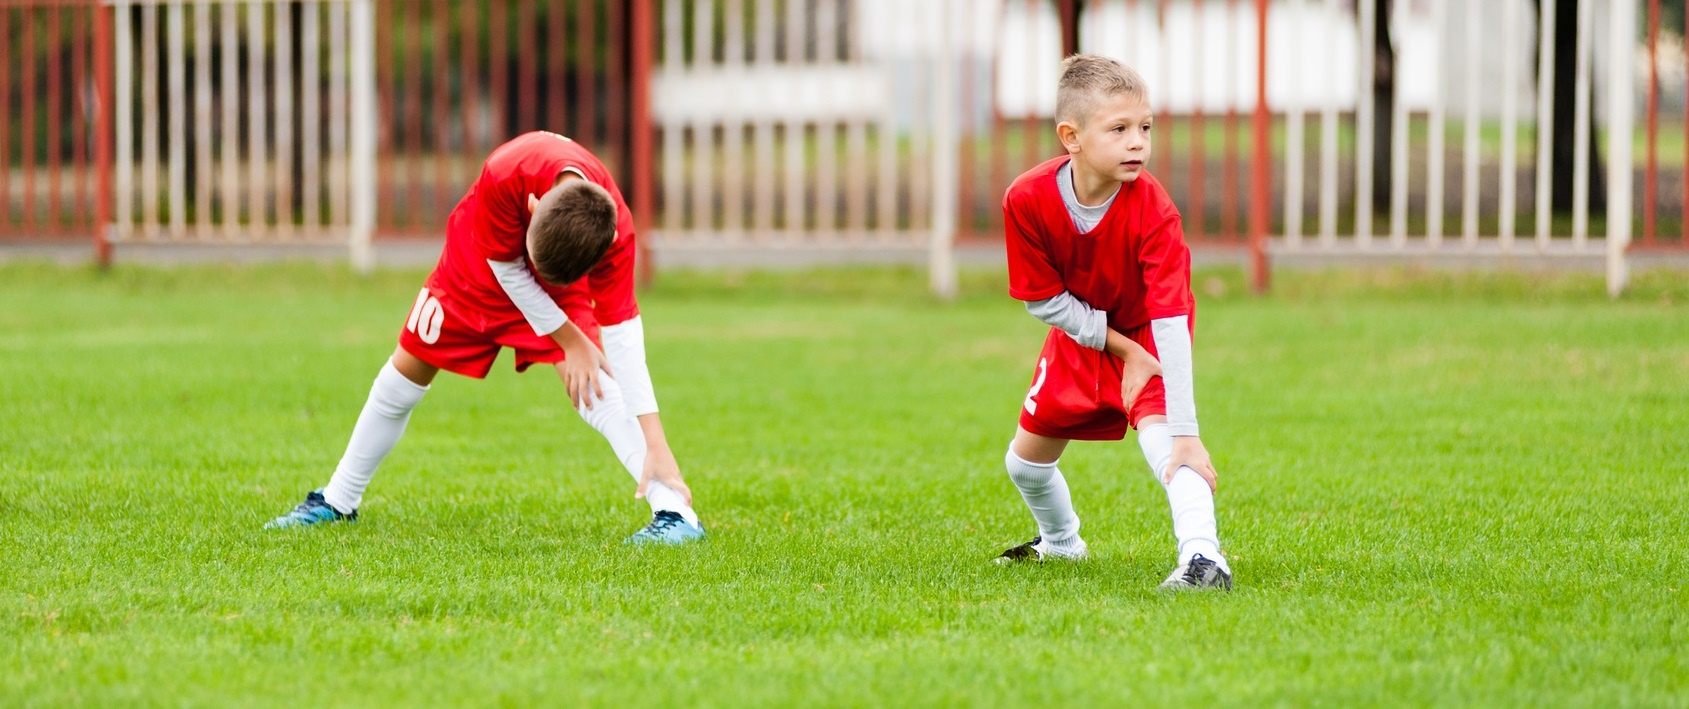 SquadLocker_SoccerInjuries-1.jpg